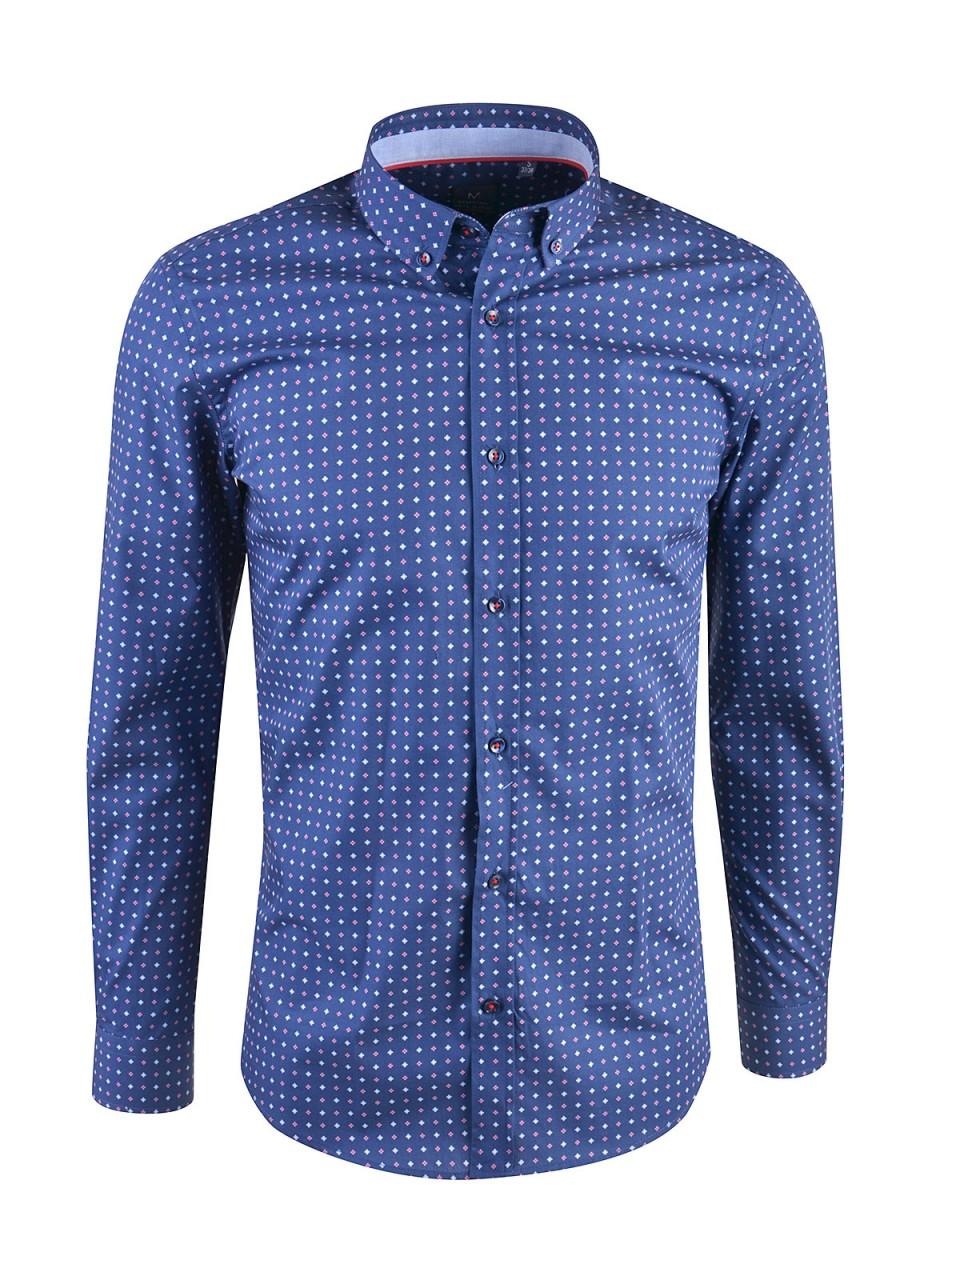 milano-italy-herren-hemd-dunkelblau